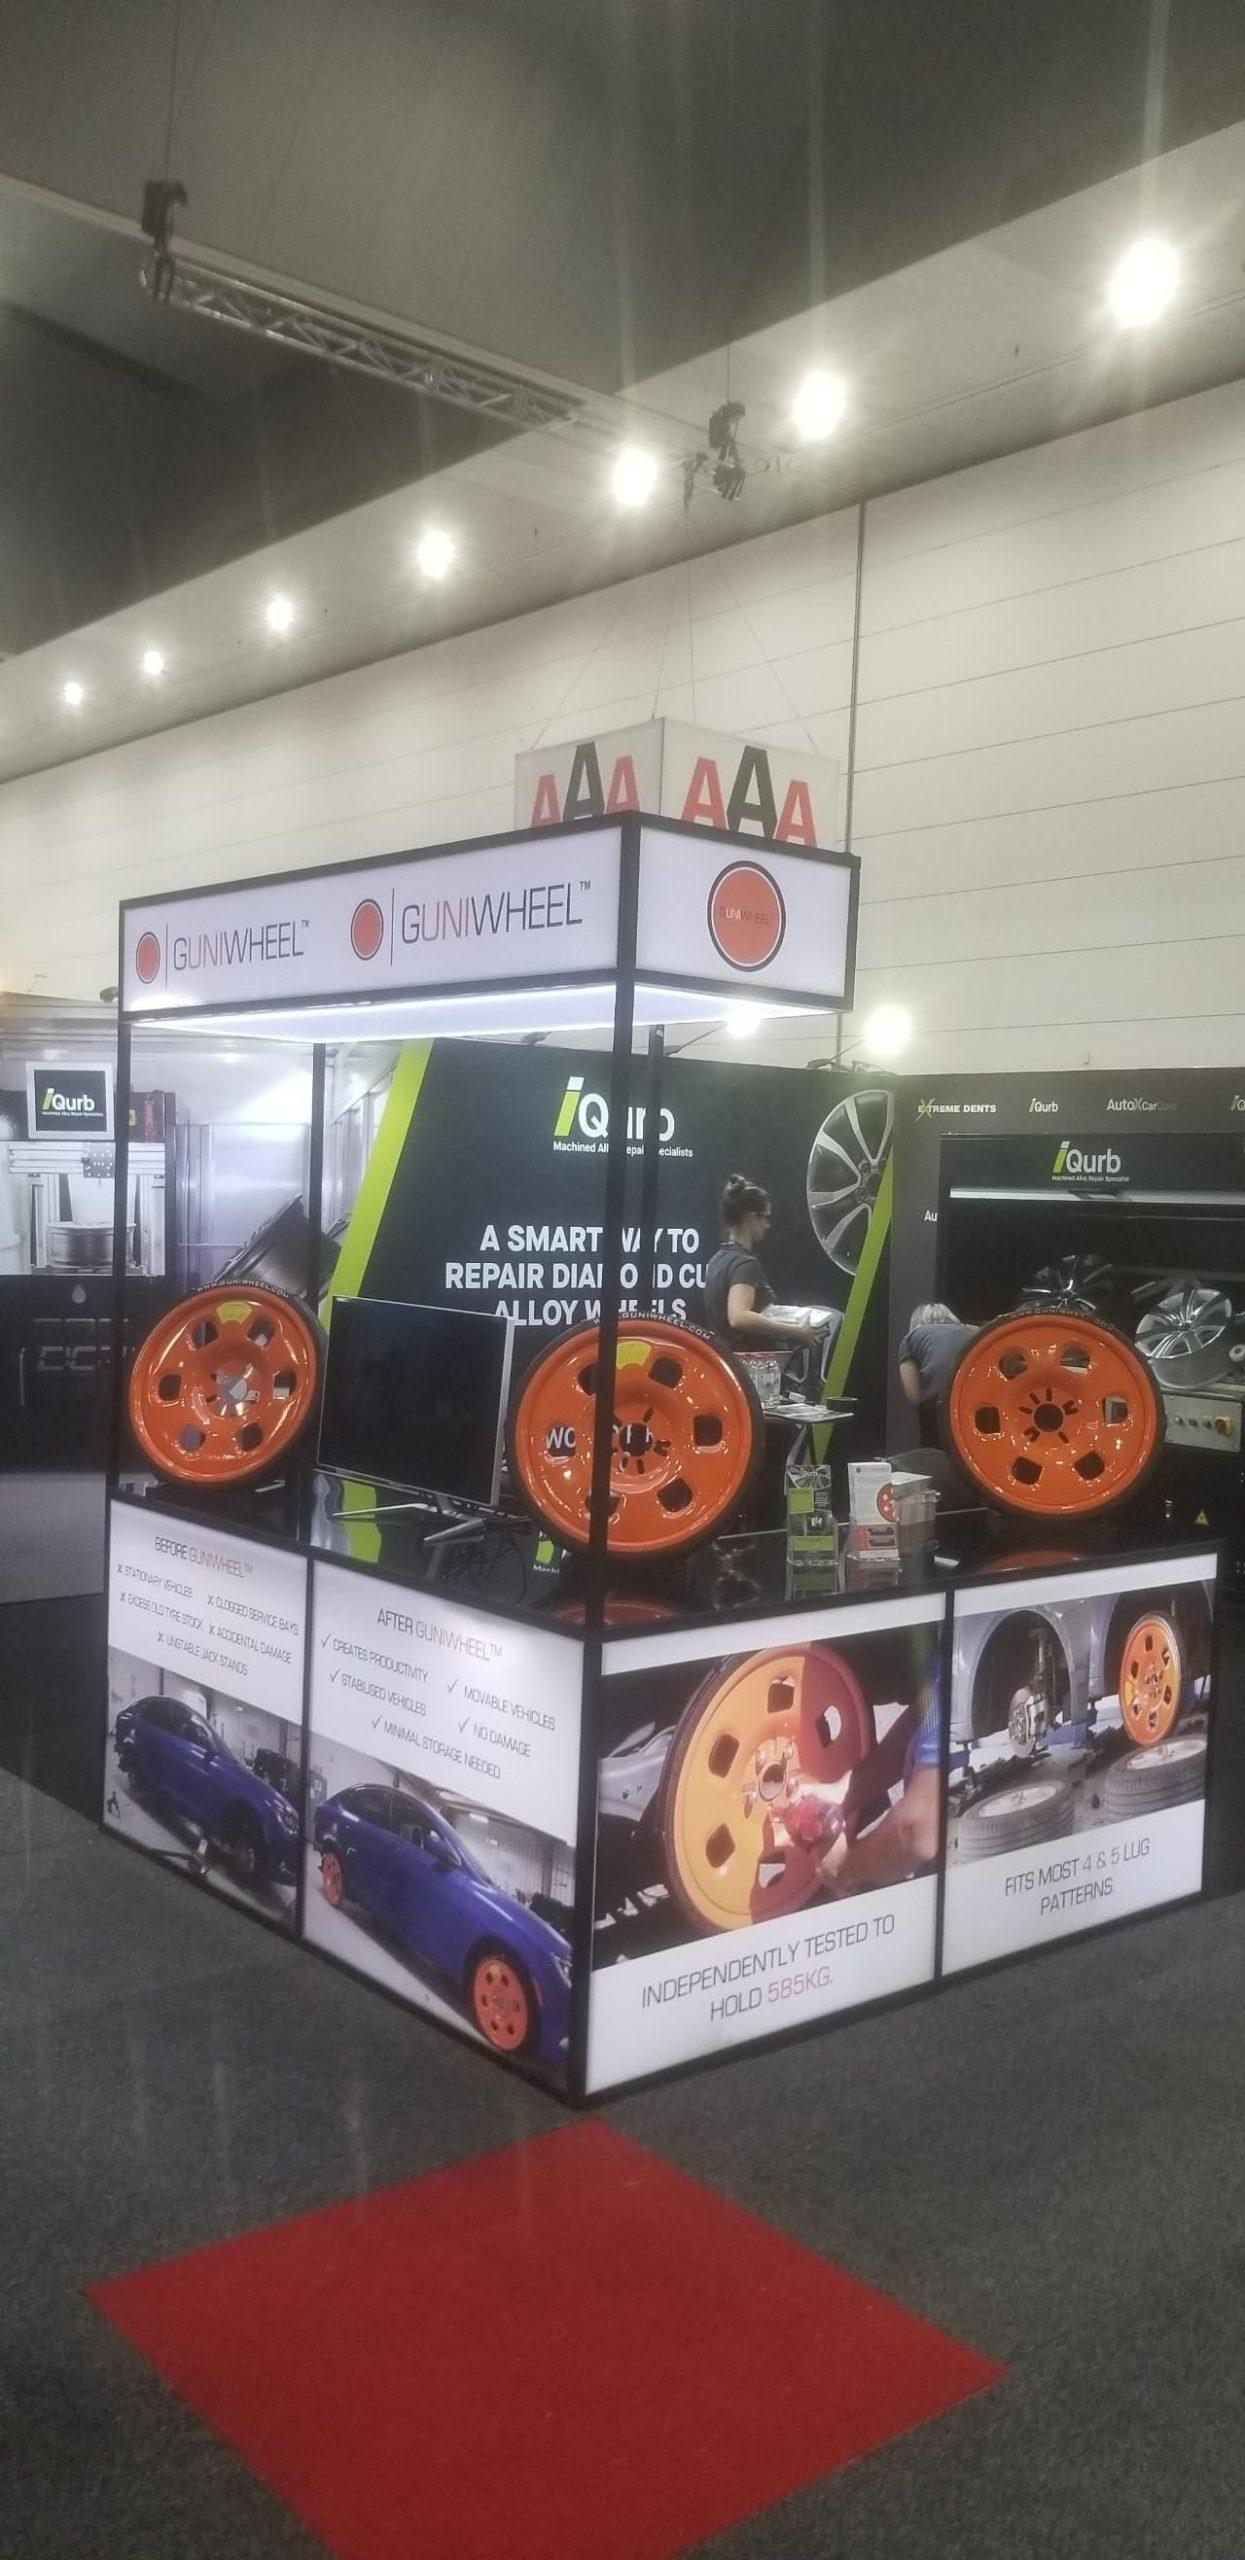 Guniwheel exhibition display